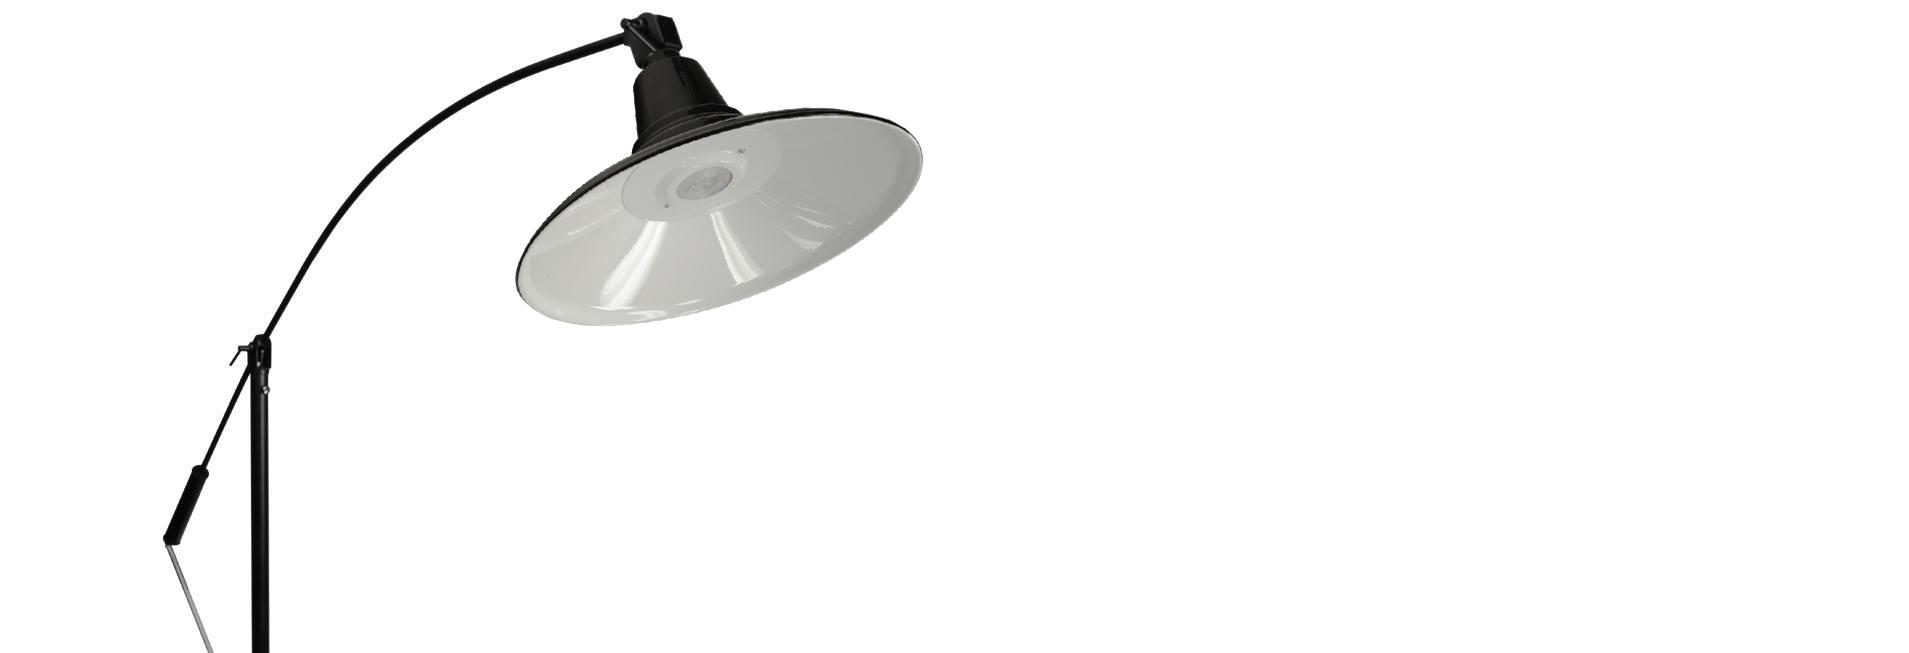 Calla LED Floor Lamp